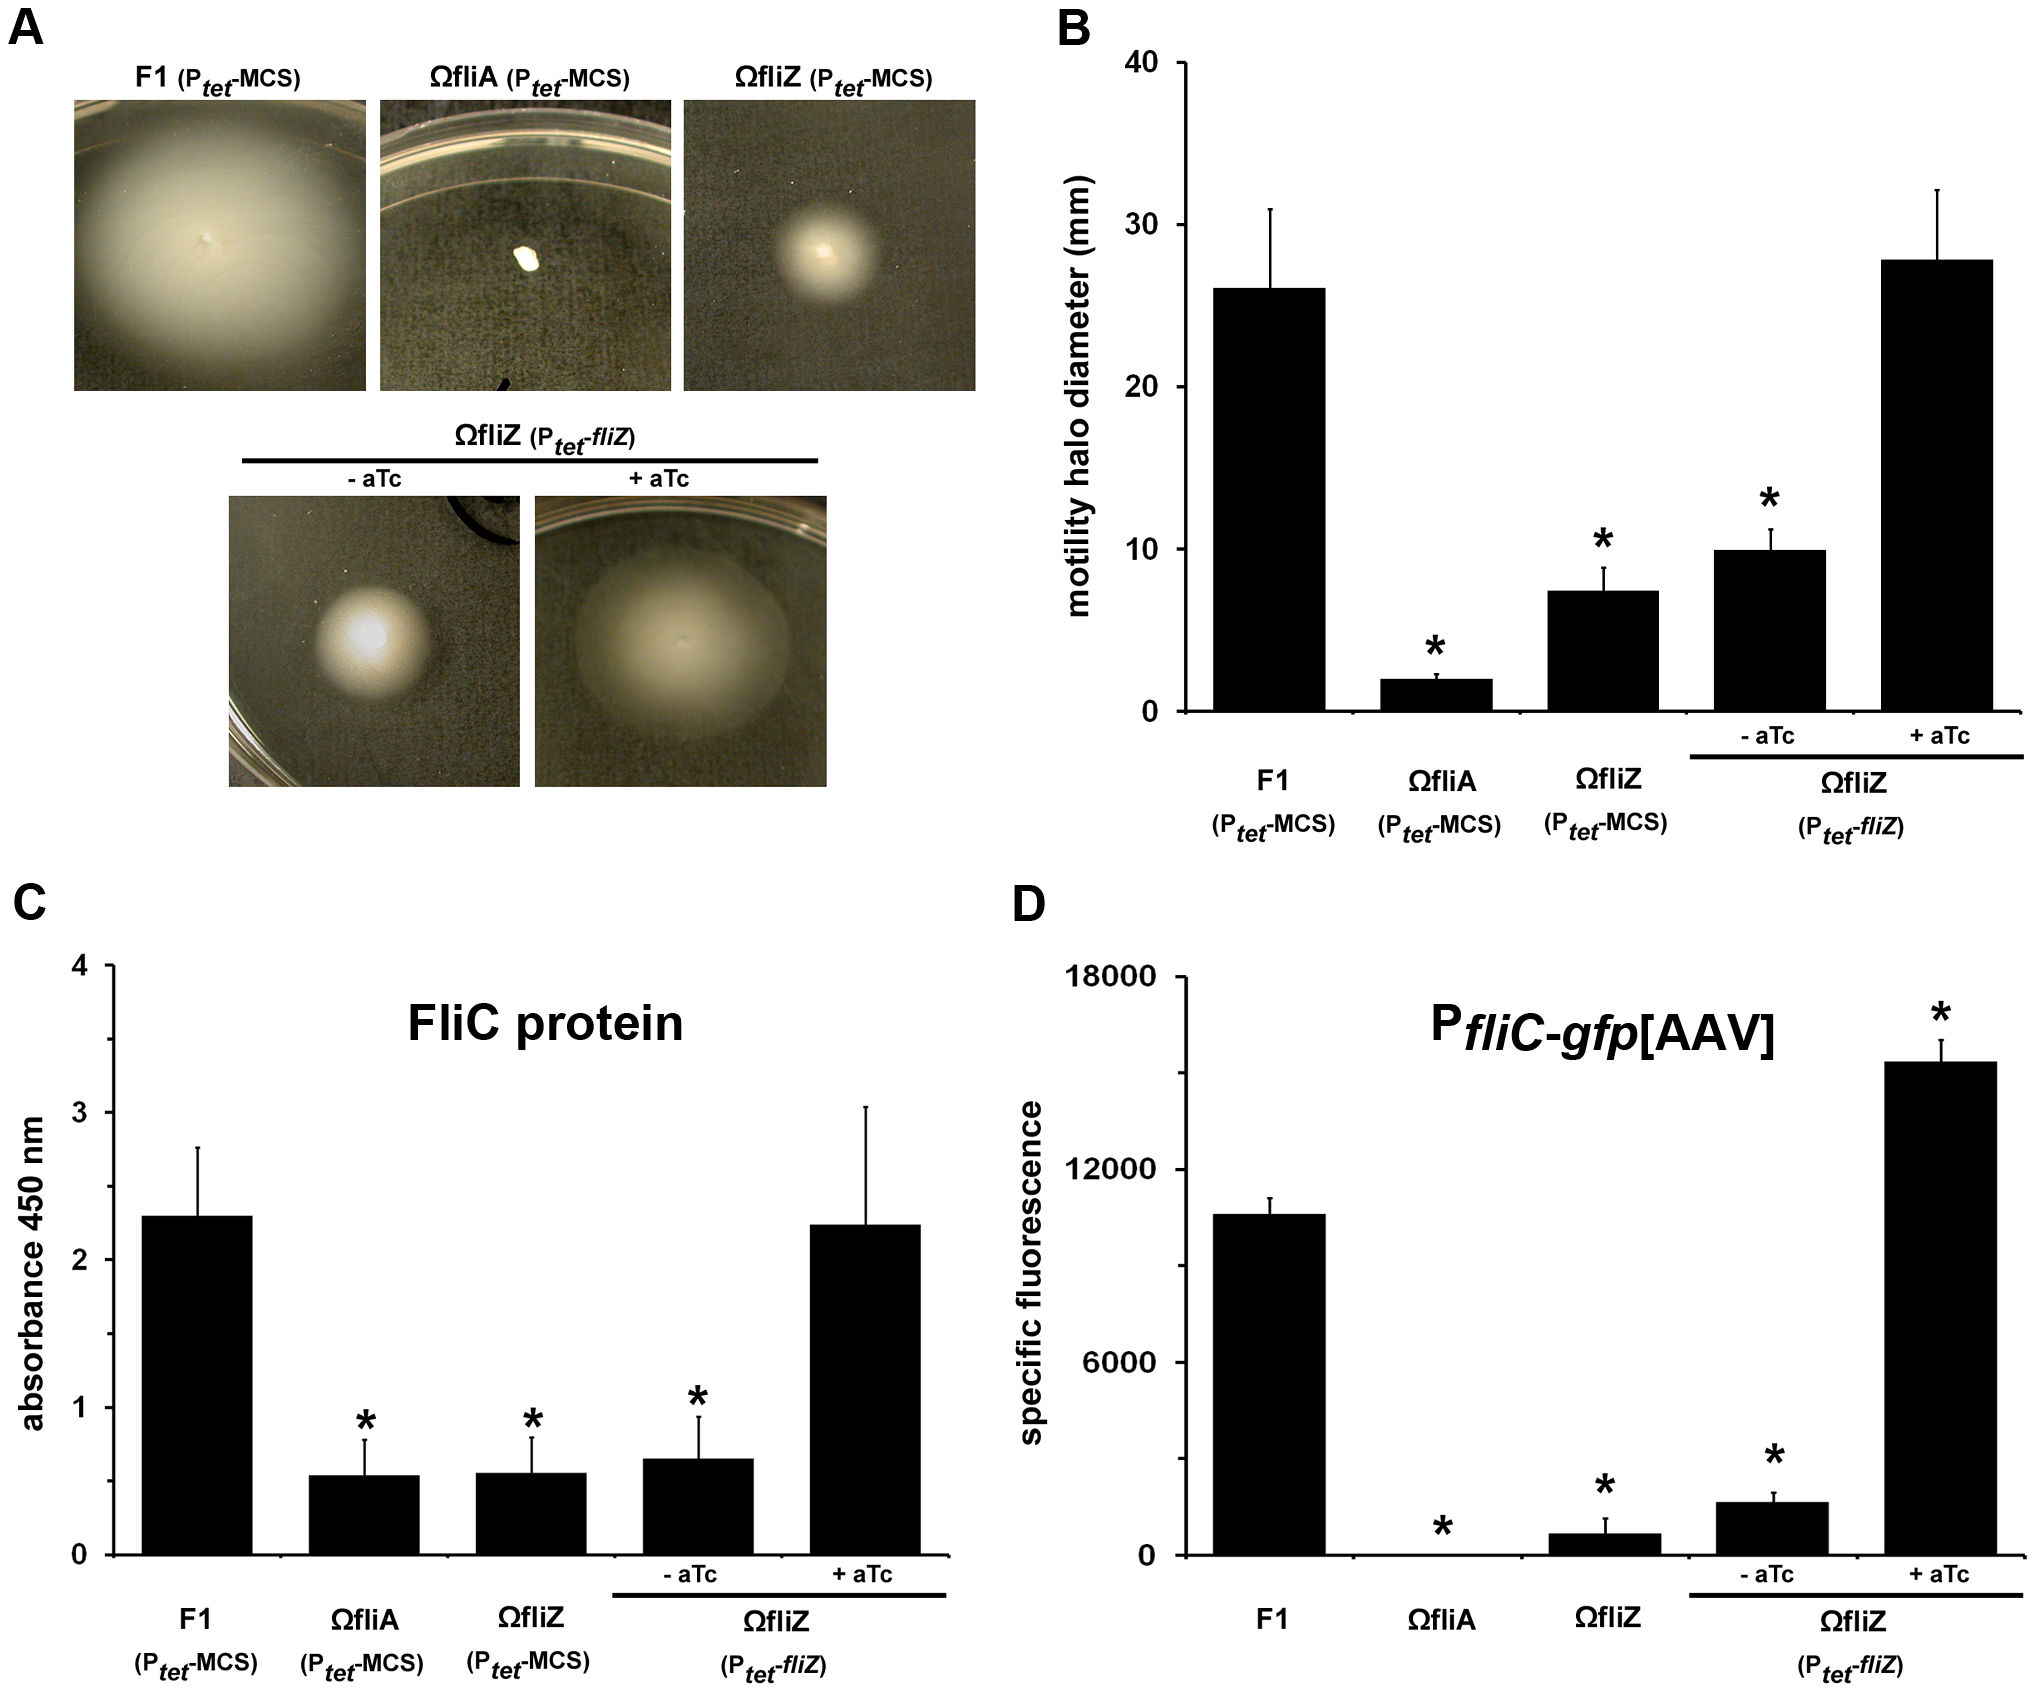 FliZ controls flagellin gene expression and motility phenotype in <i>Xenorhabdus</i>.